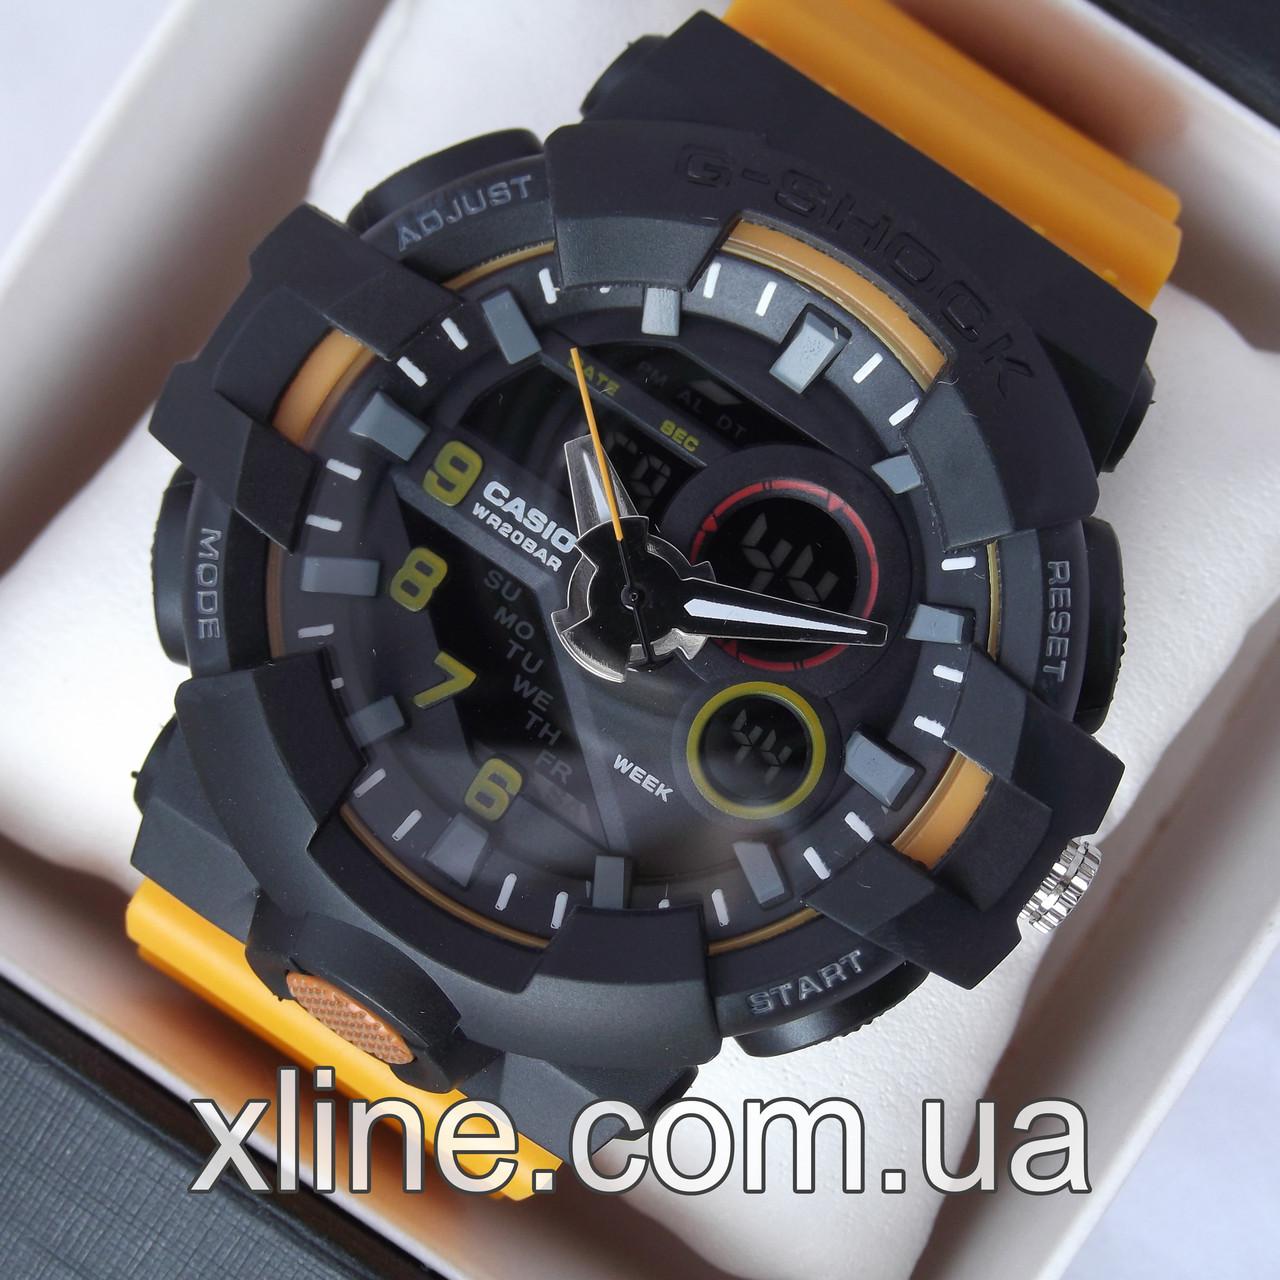 online store 3c704 5645f Мужские наручные часы G-Shock GA-700 5522 на каучуковом ремешке